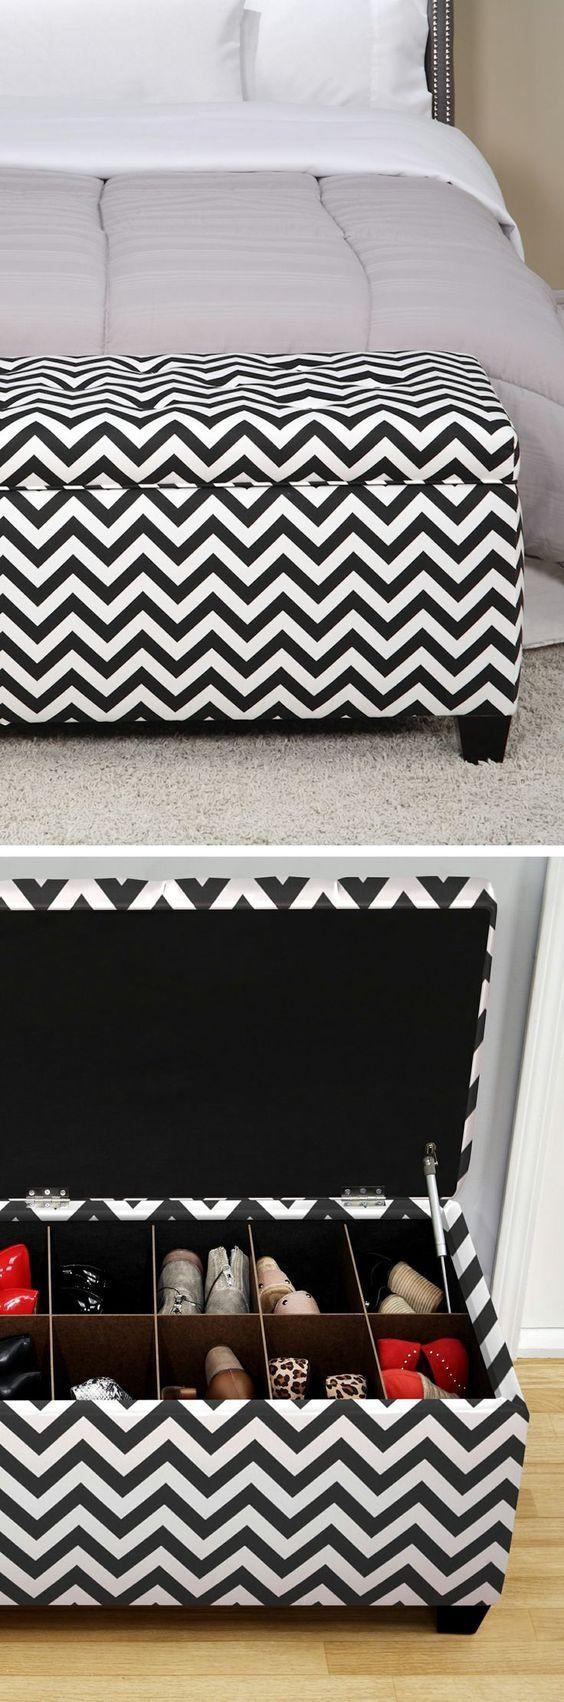 Practical Ideas that Solve Your Shoe Storage Dilemmas - 73 Best Images About Shoe Storage On Pinterest Shoe Display